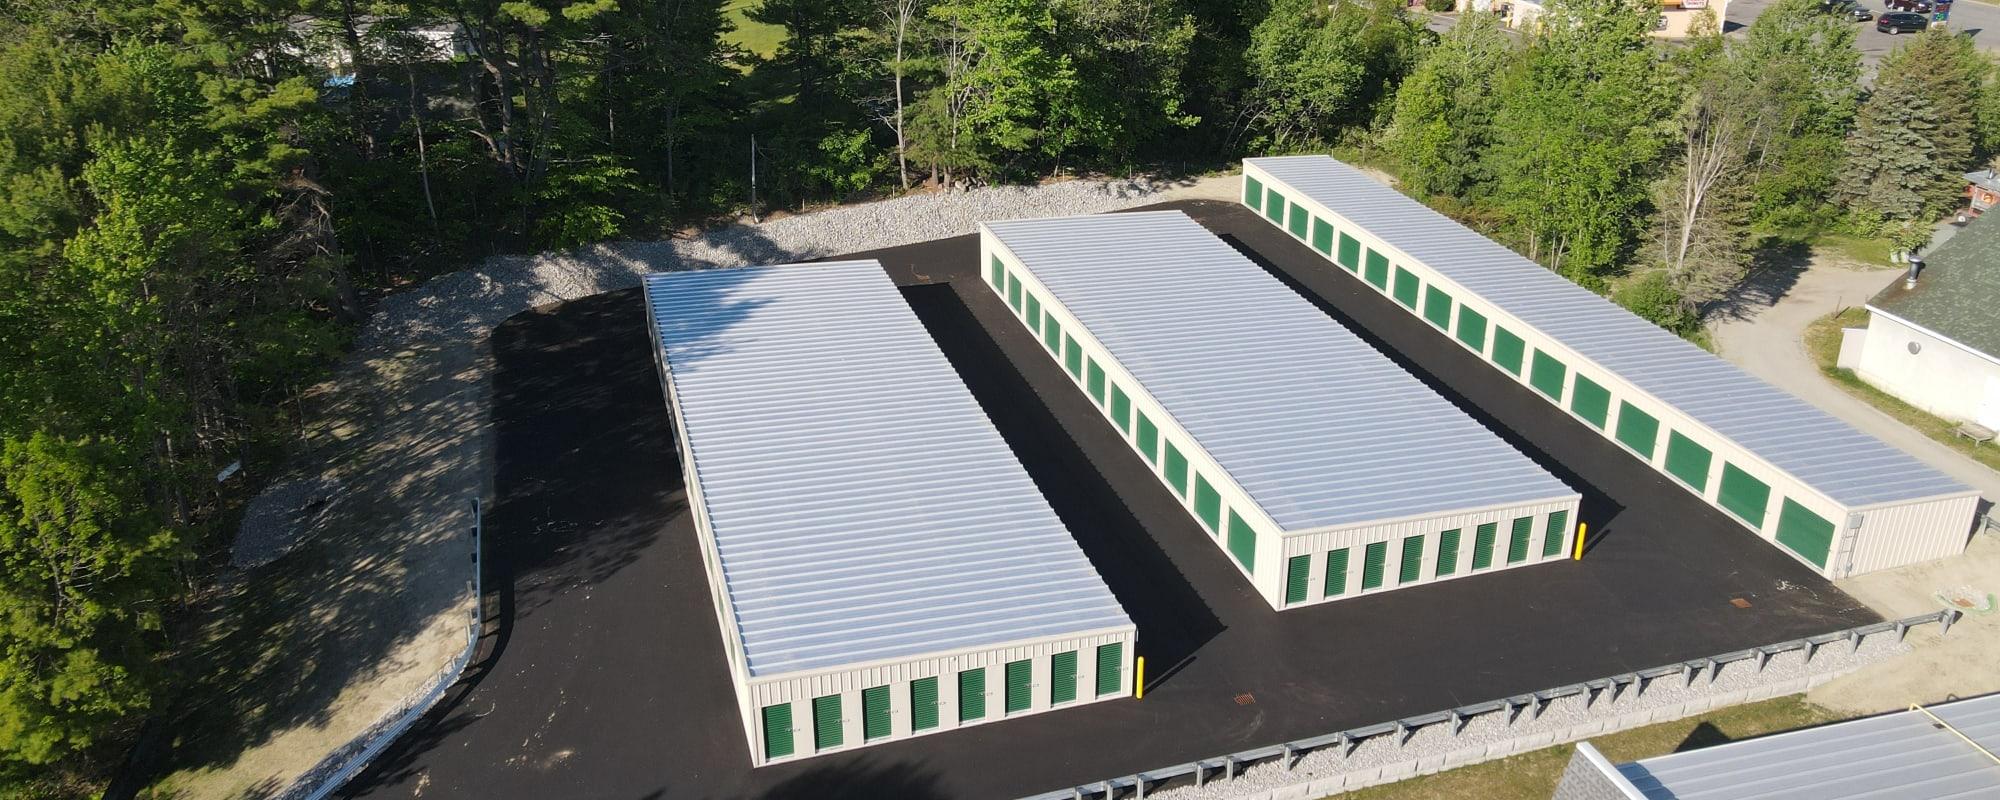 603 Storage - Belmont self storage in Belmont, New Hampshire